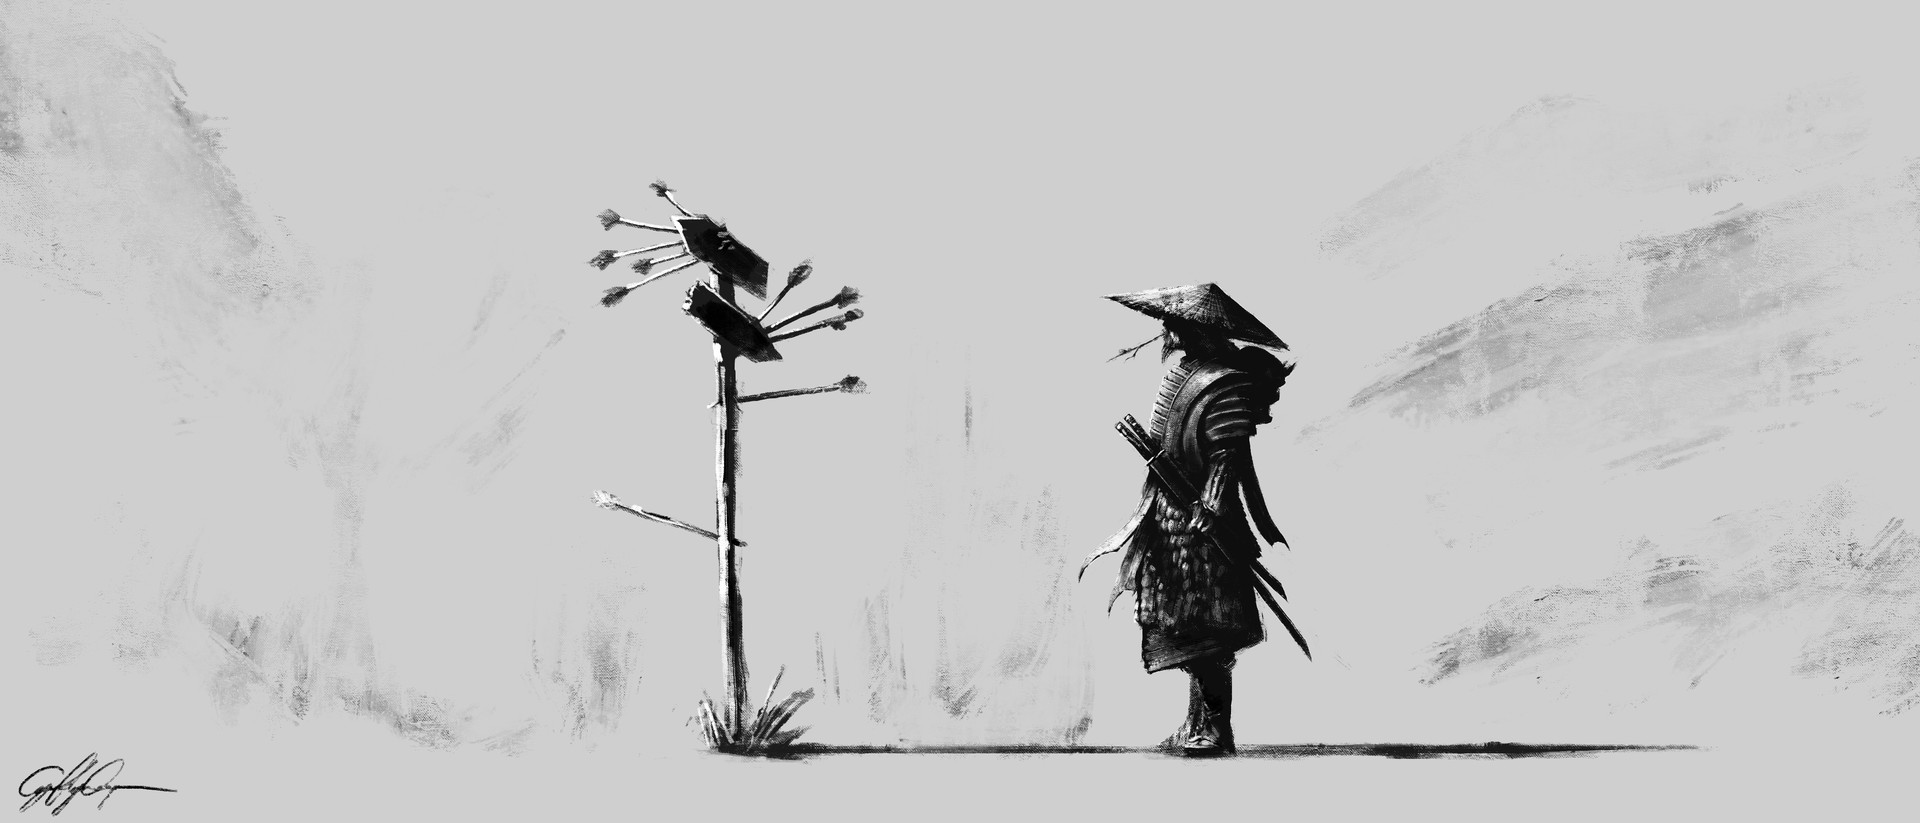 Caglayan kaya goksoy lost samurai